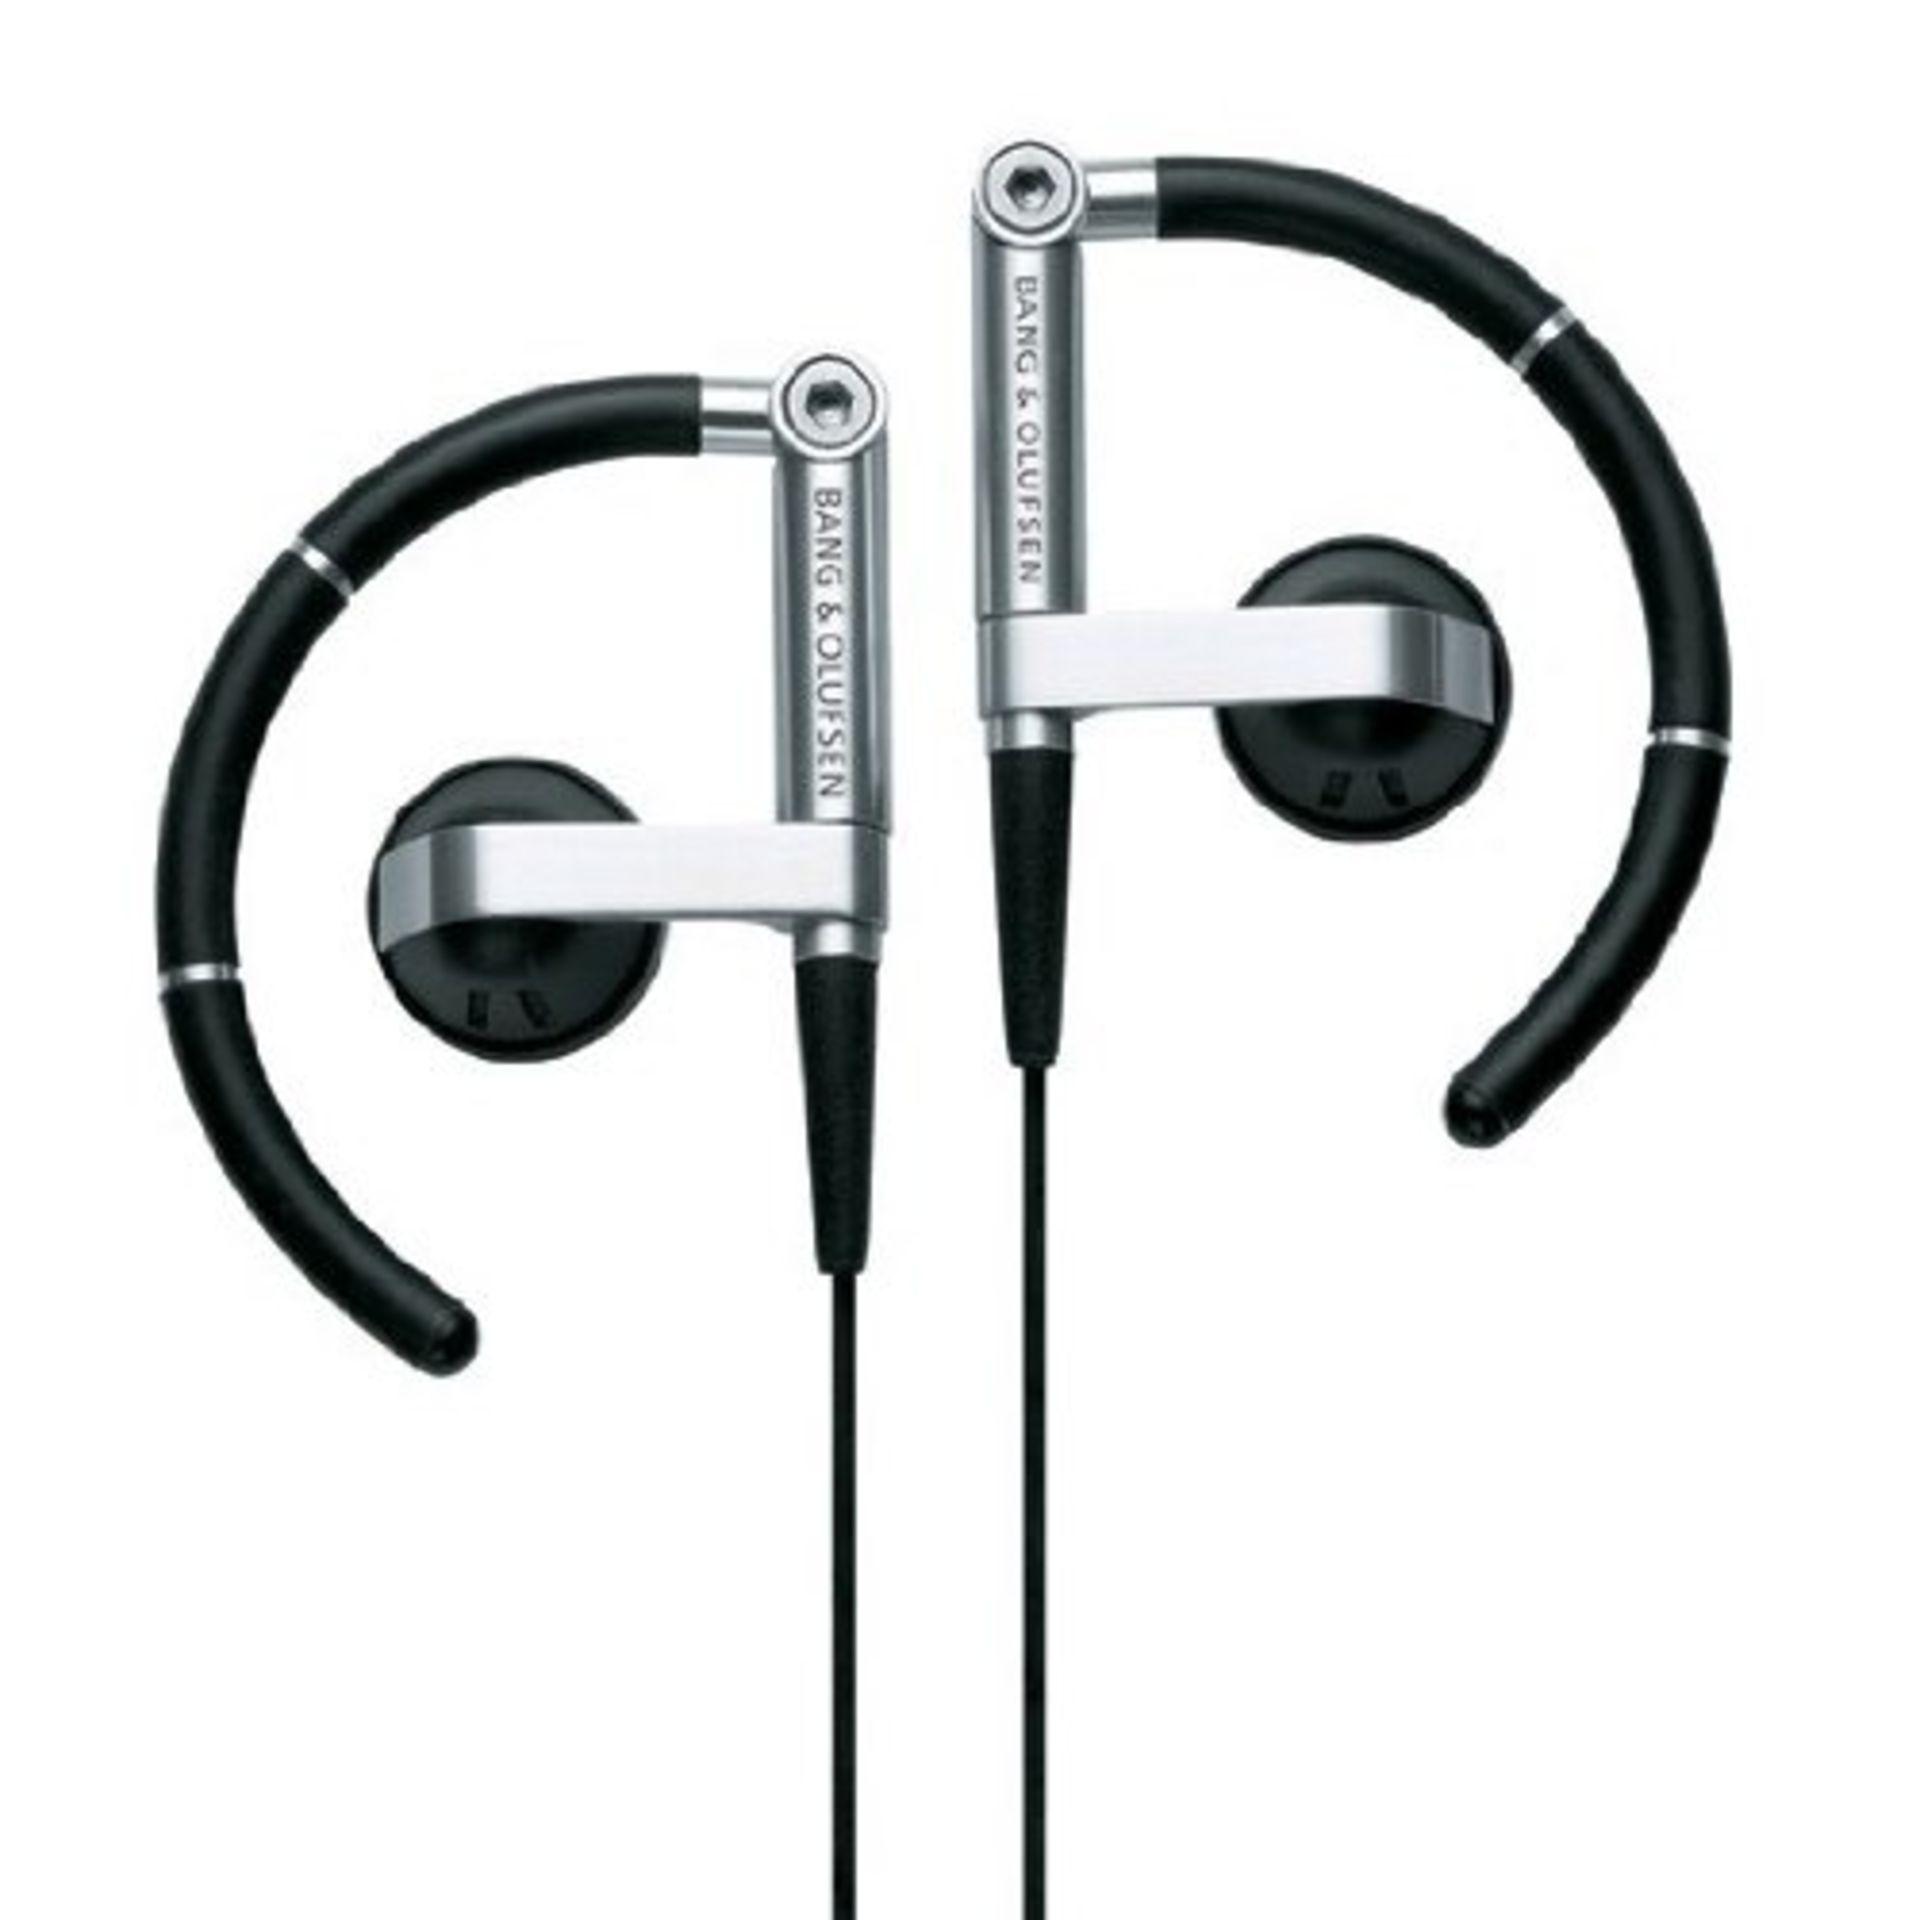 Lot 10071 - V Brand New Bang & Olufsen A8 Earphones Aluminium Black - Amazon Price £119.99